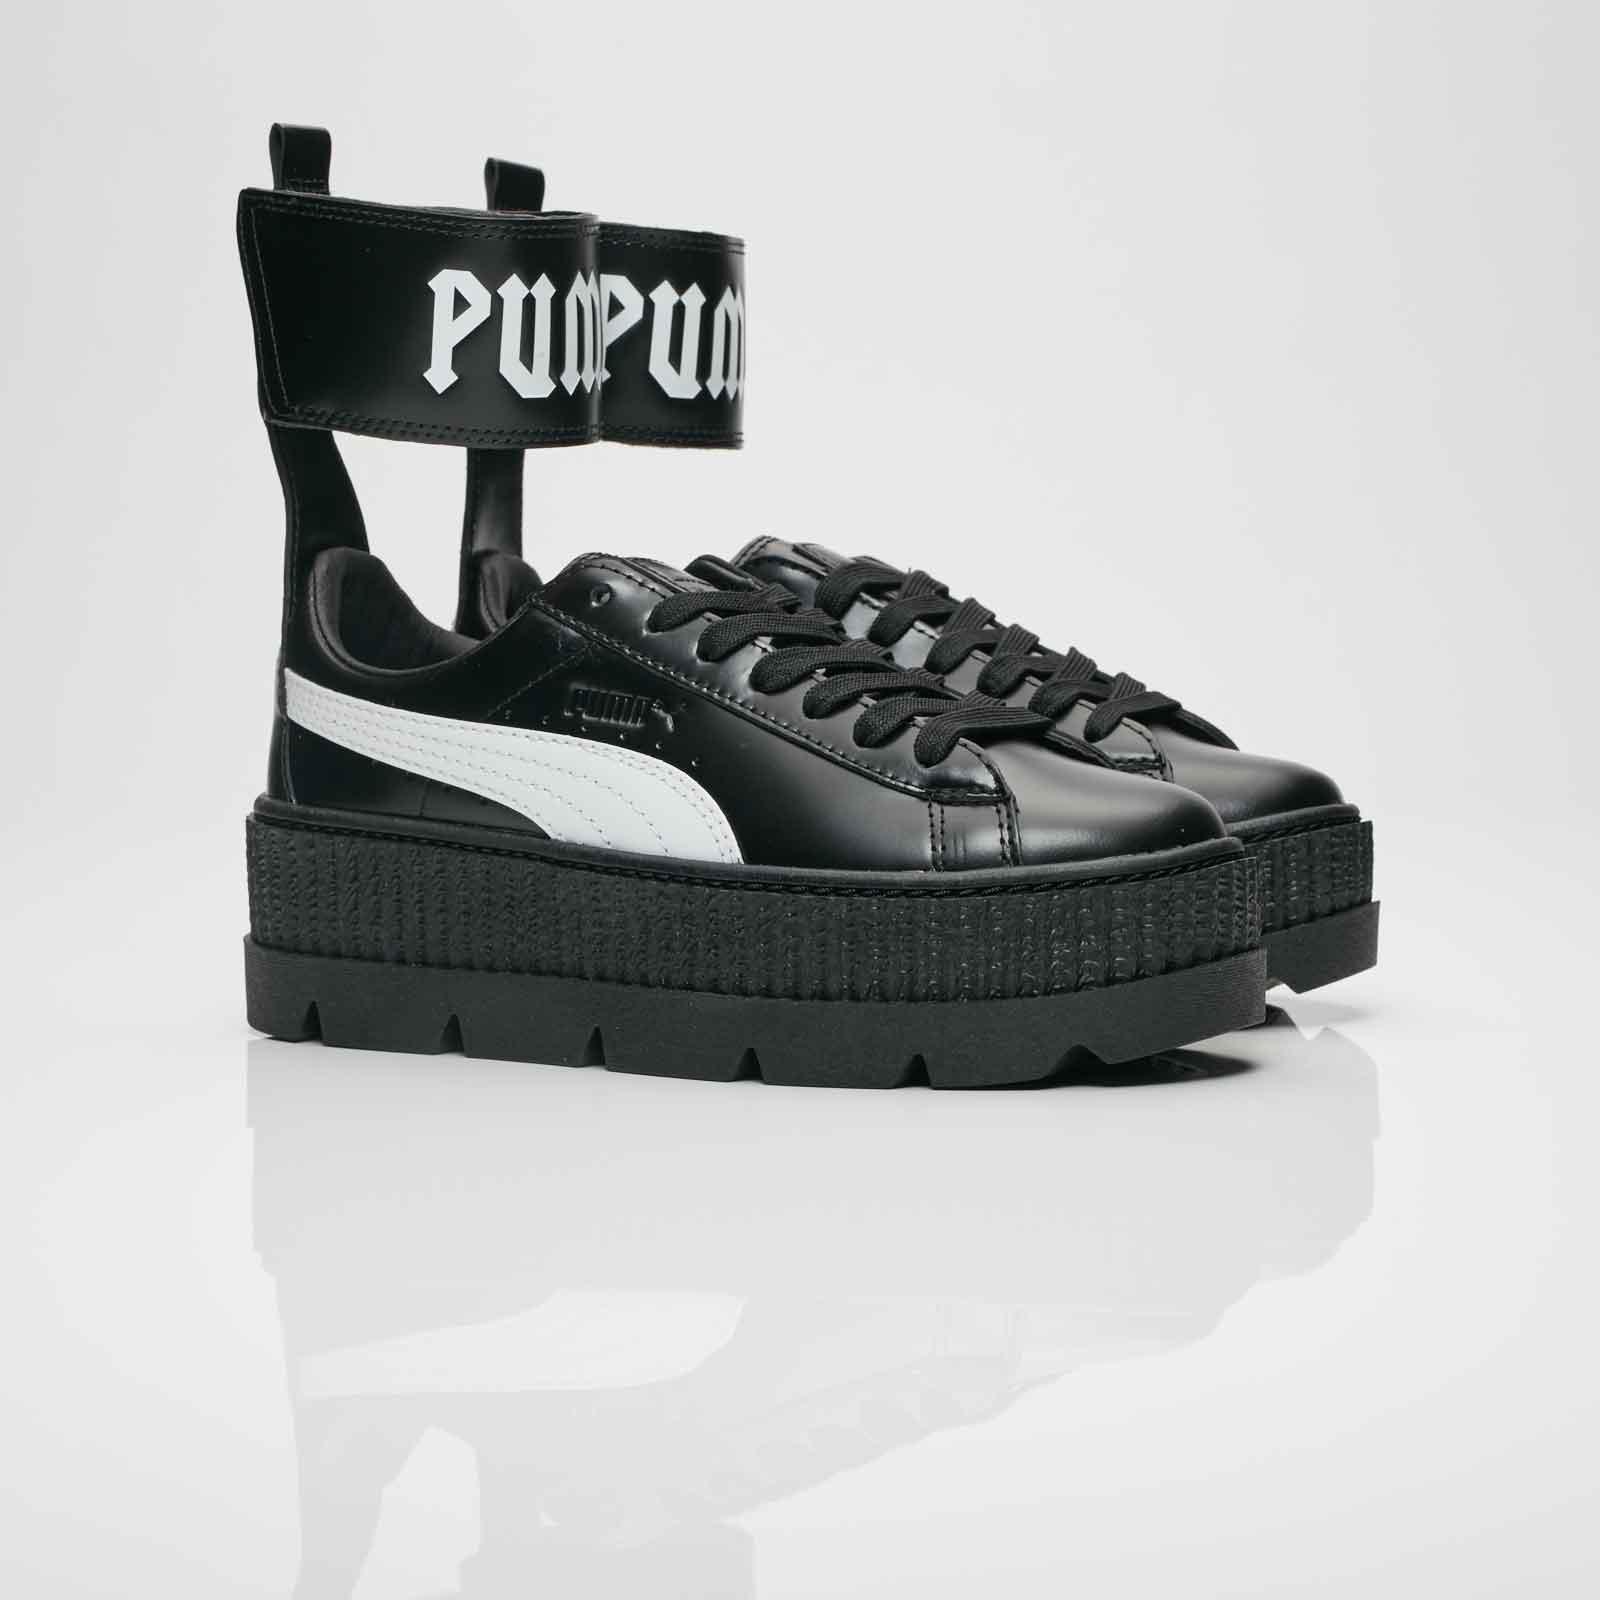 Puma Ankle Strap Sneaker Wns - 366264-03 - Sneakersnstuff  6478ad7533